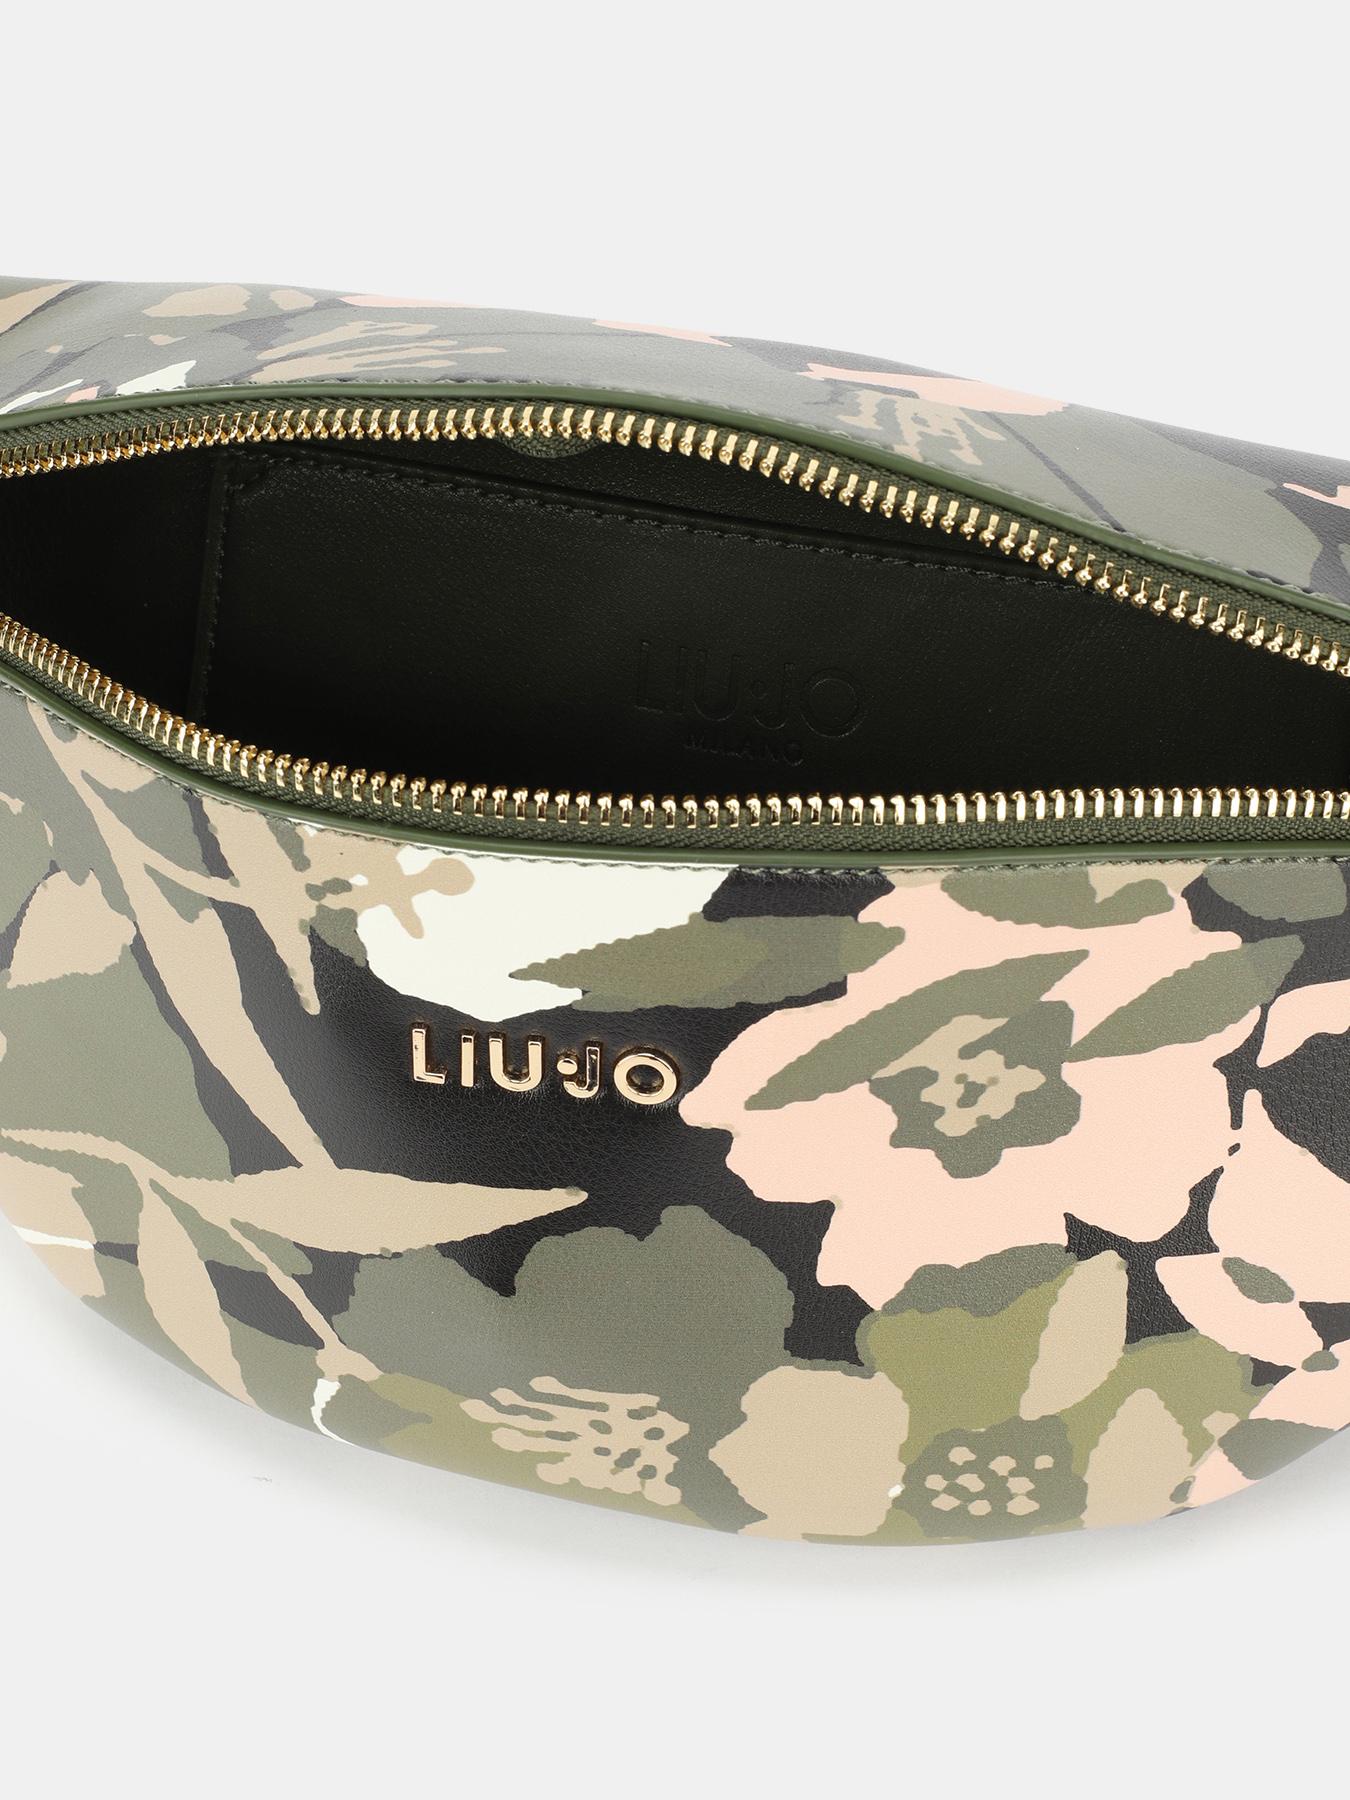 Liu Jo Женская сумка 360908-185 Фото 3